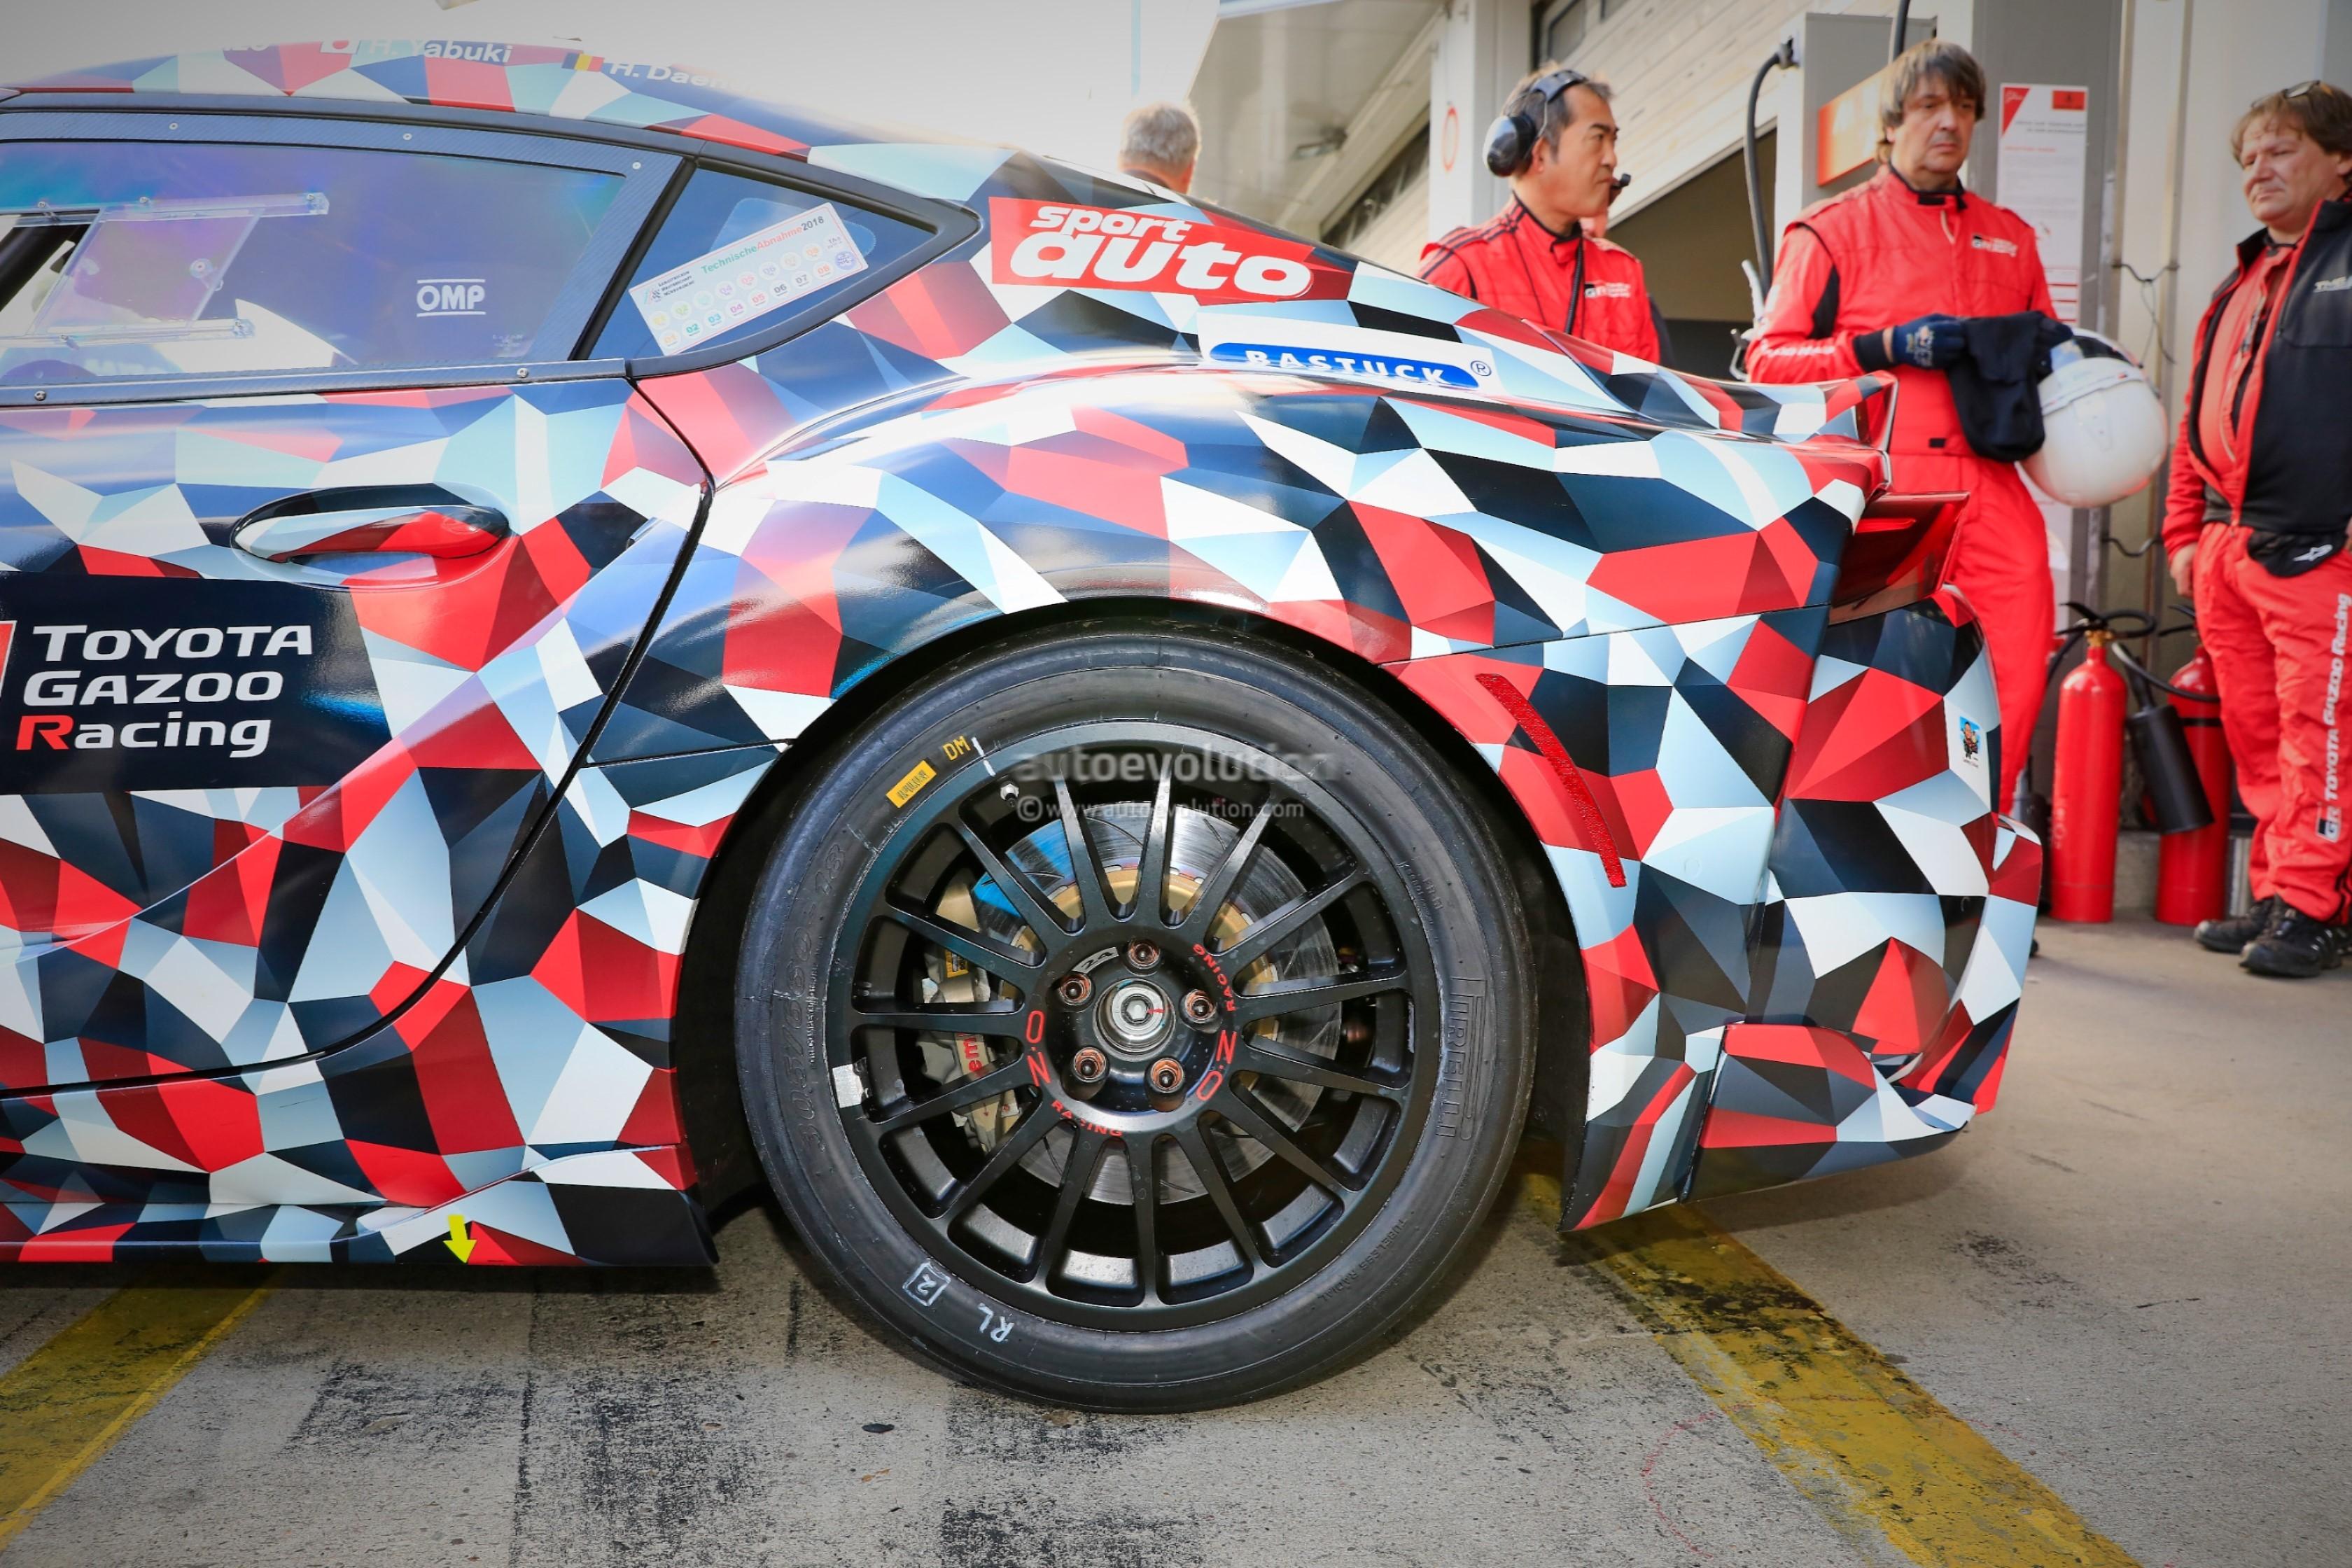 Toyota celebrity race 2019